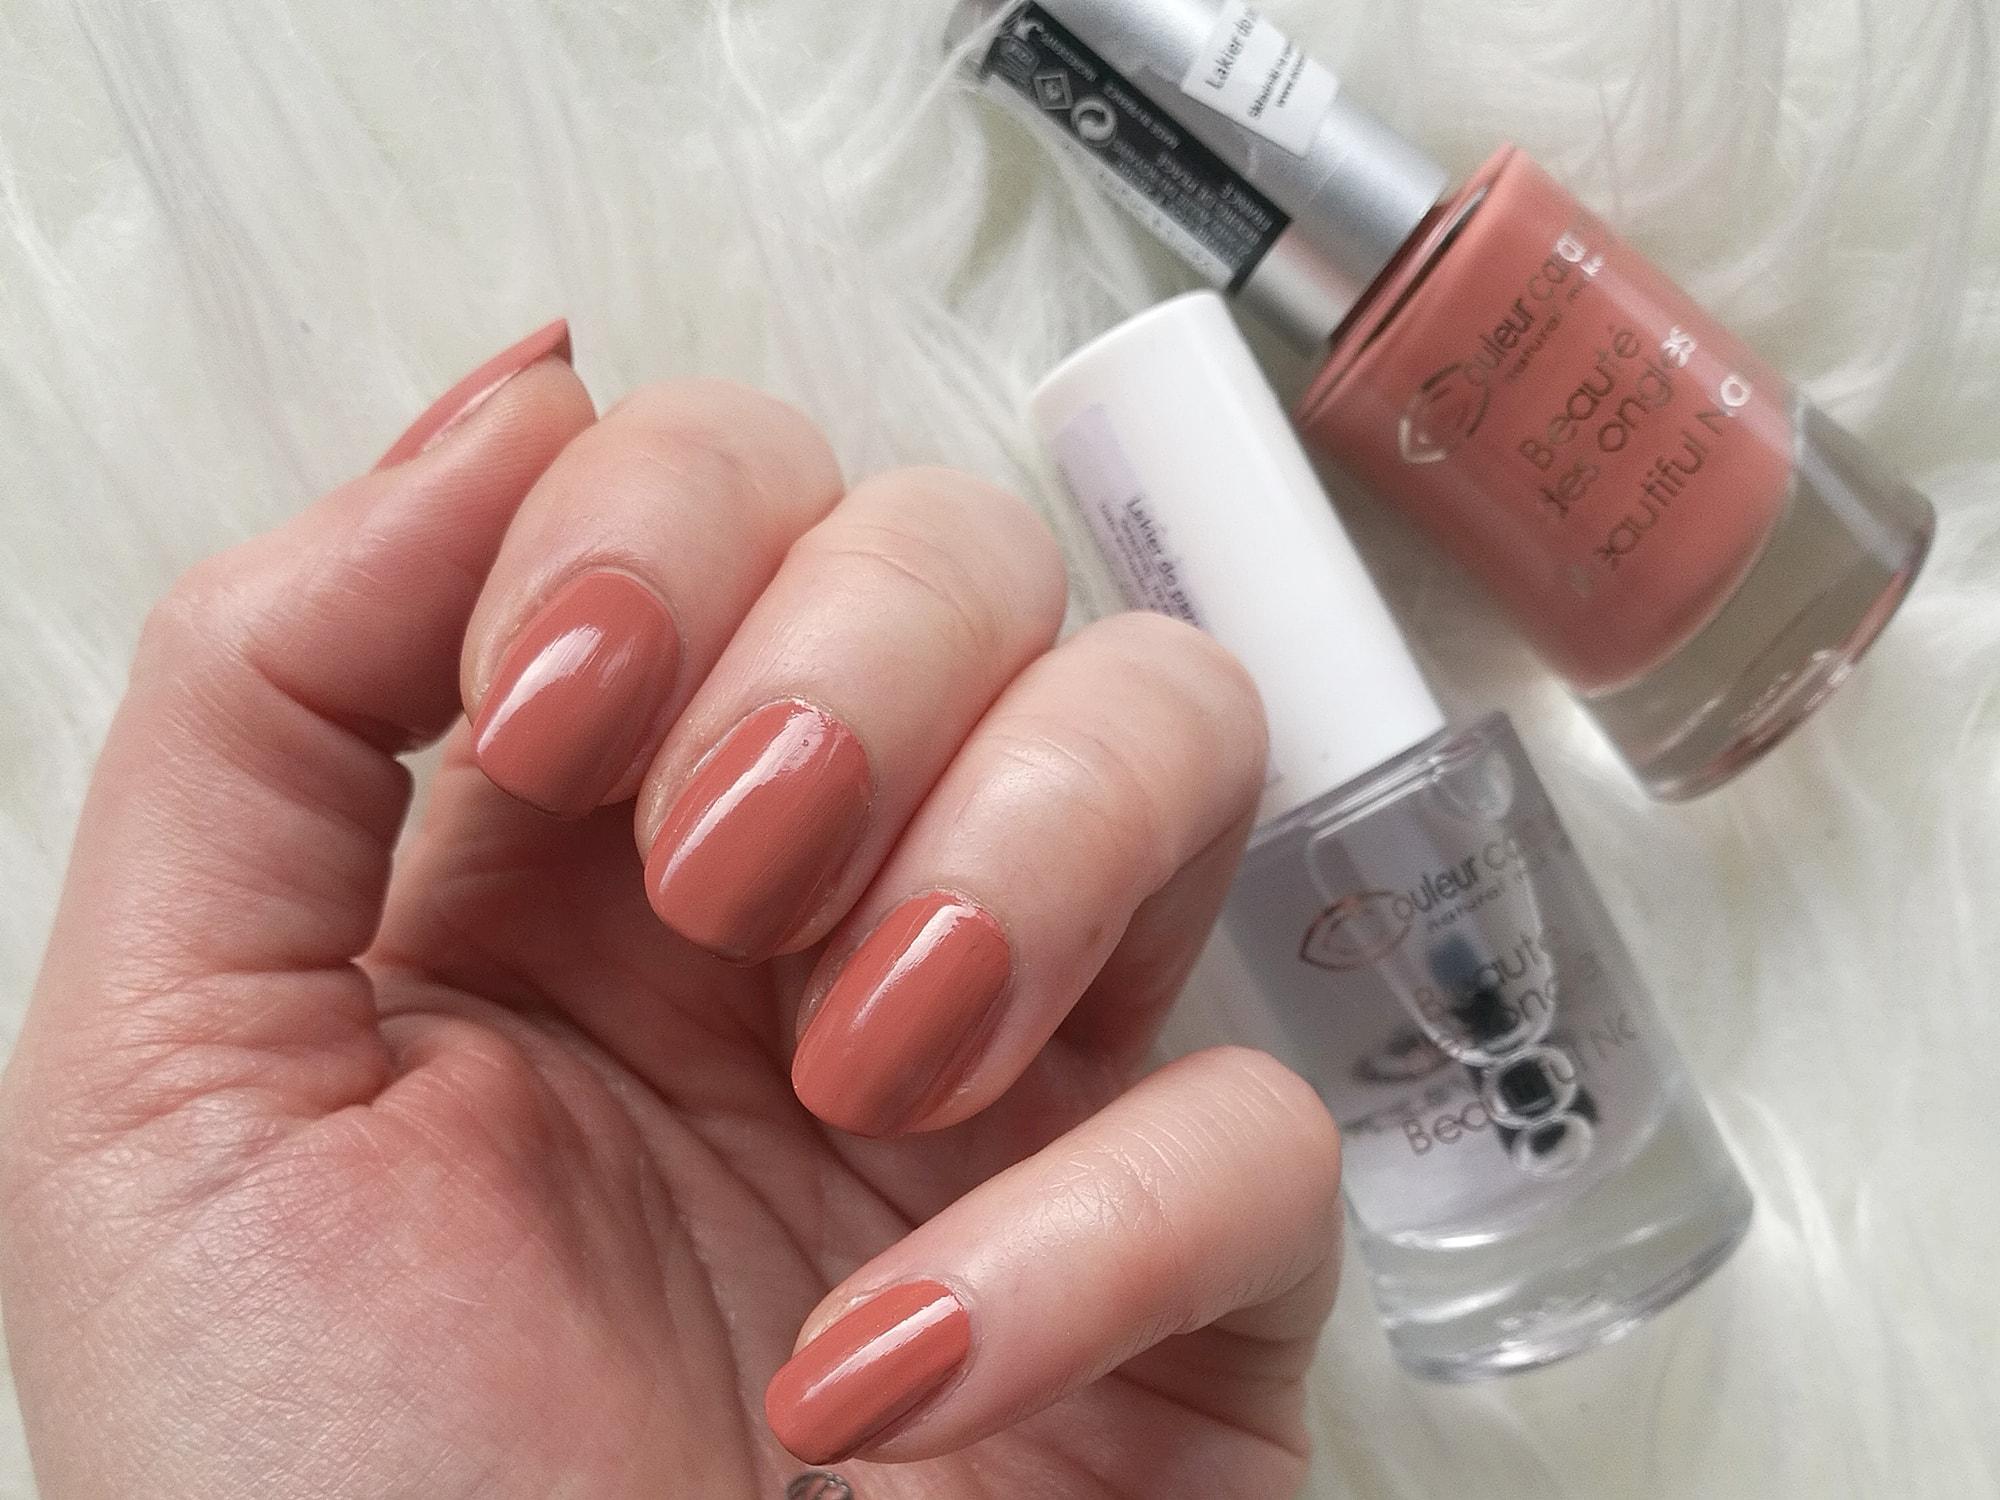 lakiery-couleur-caramel-blog